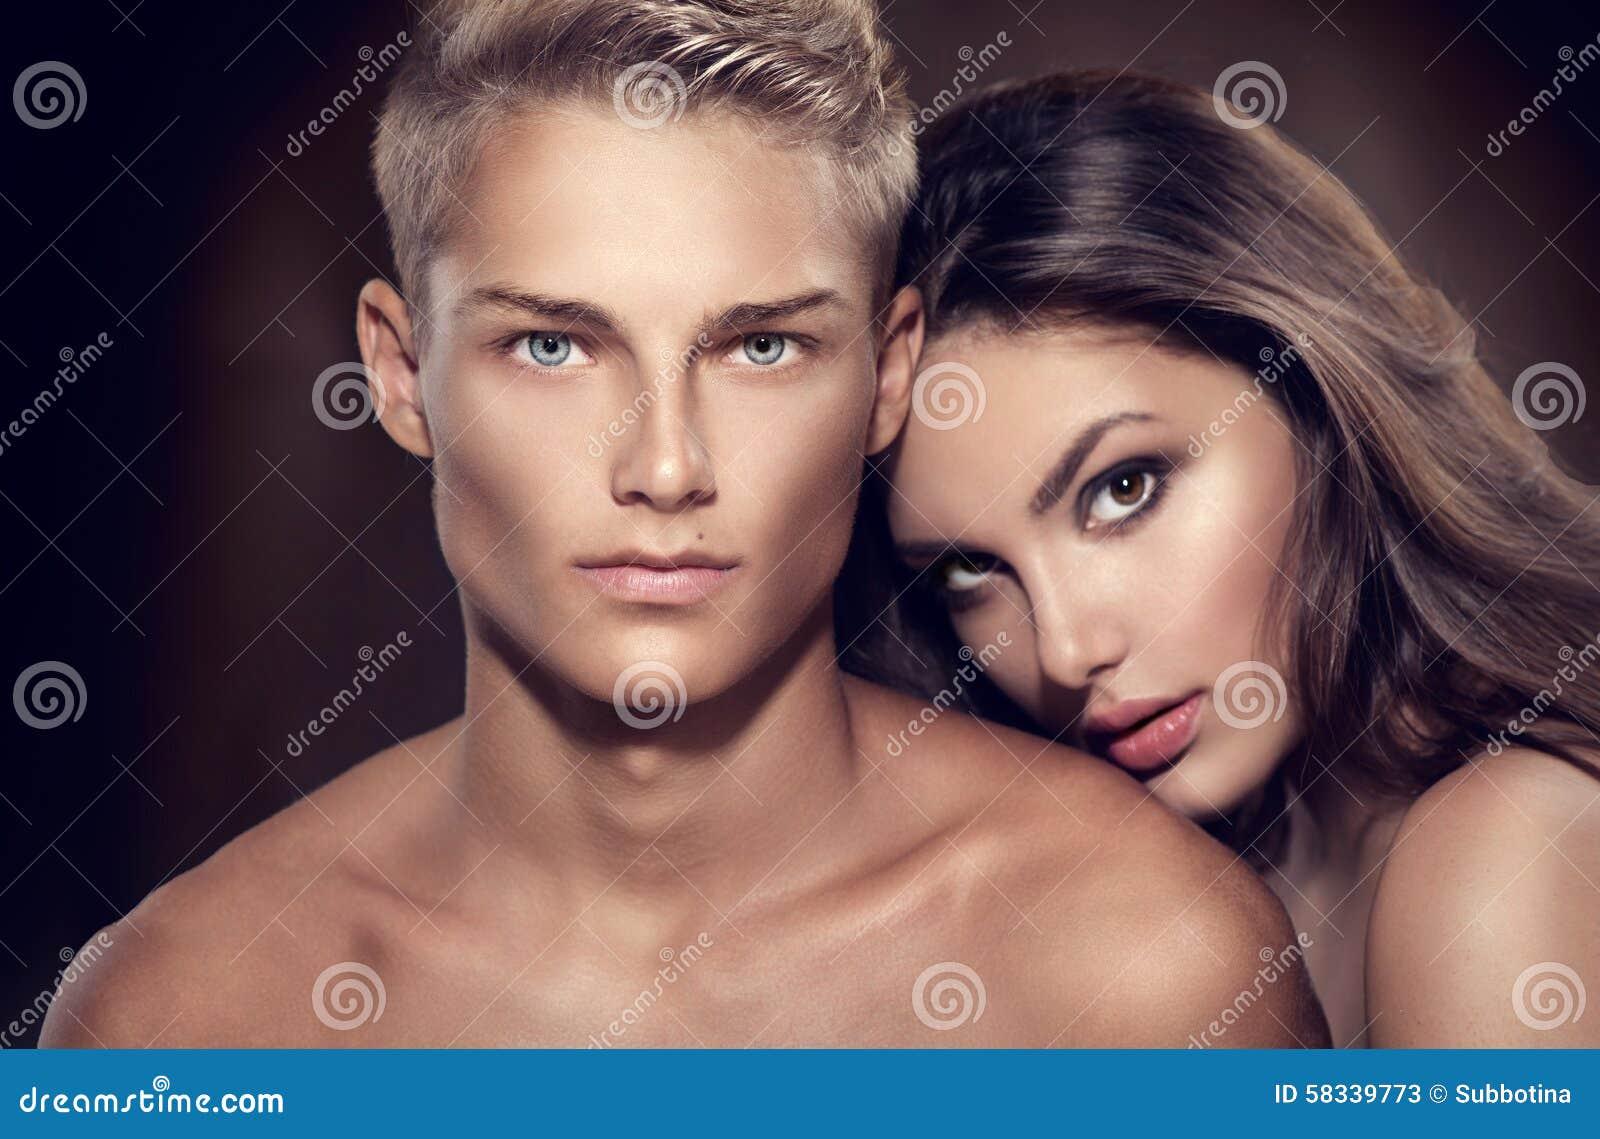 Idea think, photos of sexy model couple